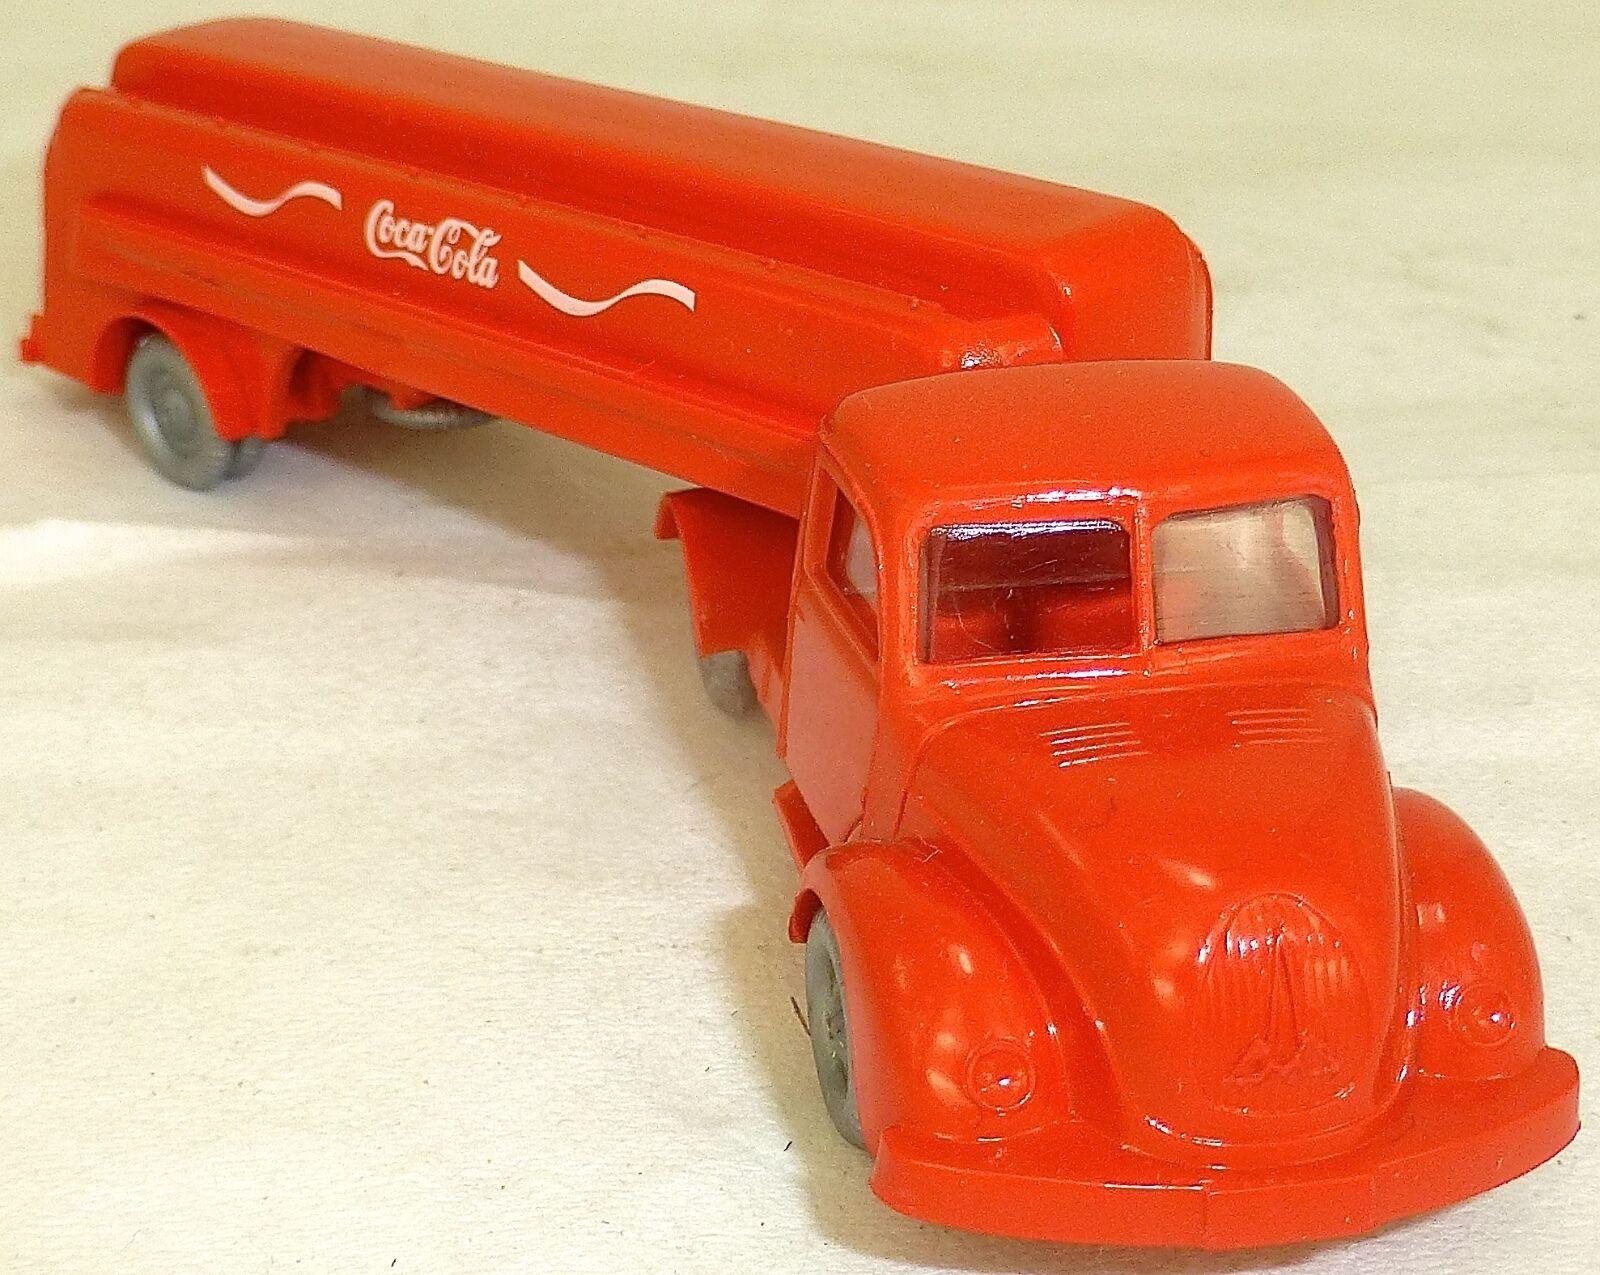 Tanksattelzug Mercedes 3500 Rundhauber Coca Cola Cola Cola red IMU H0 1 87 å   56285c